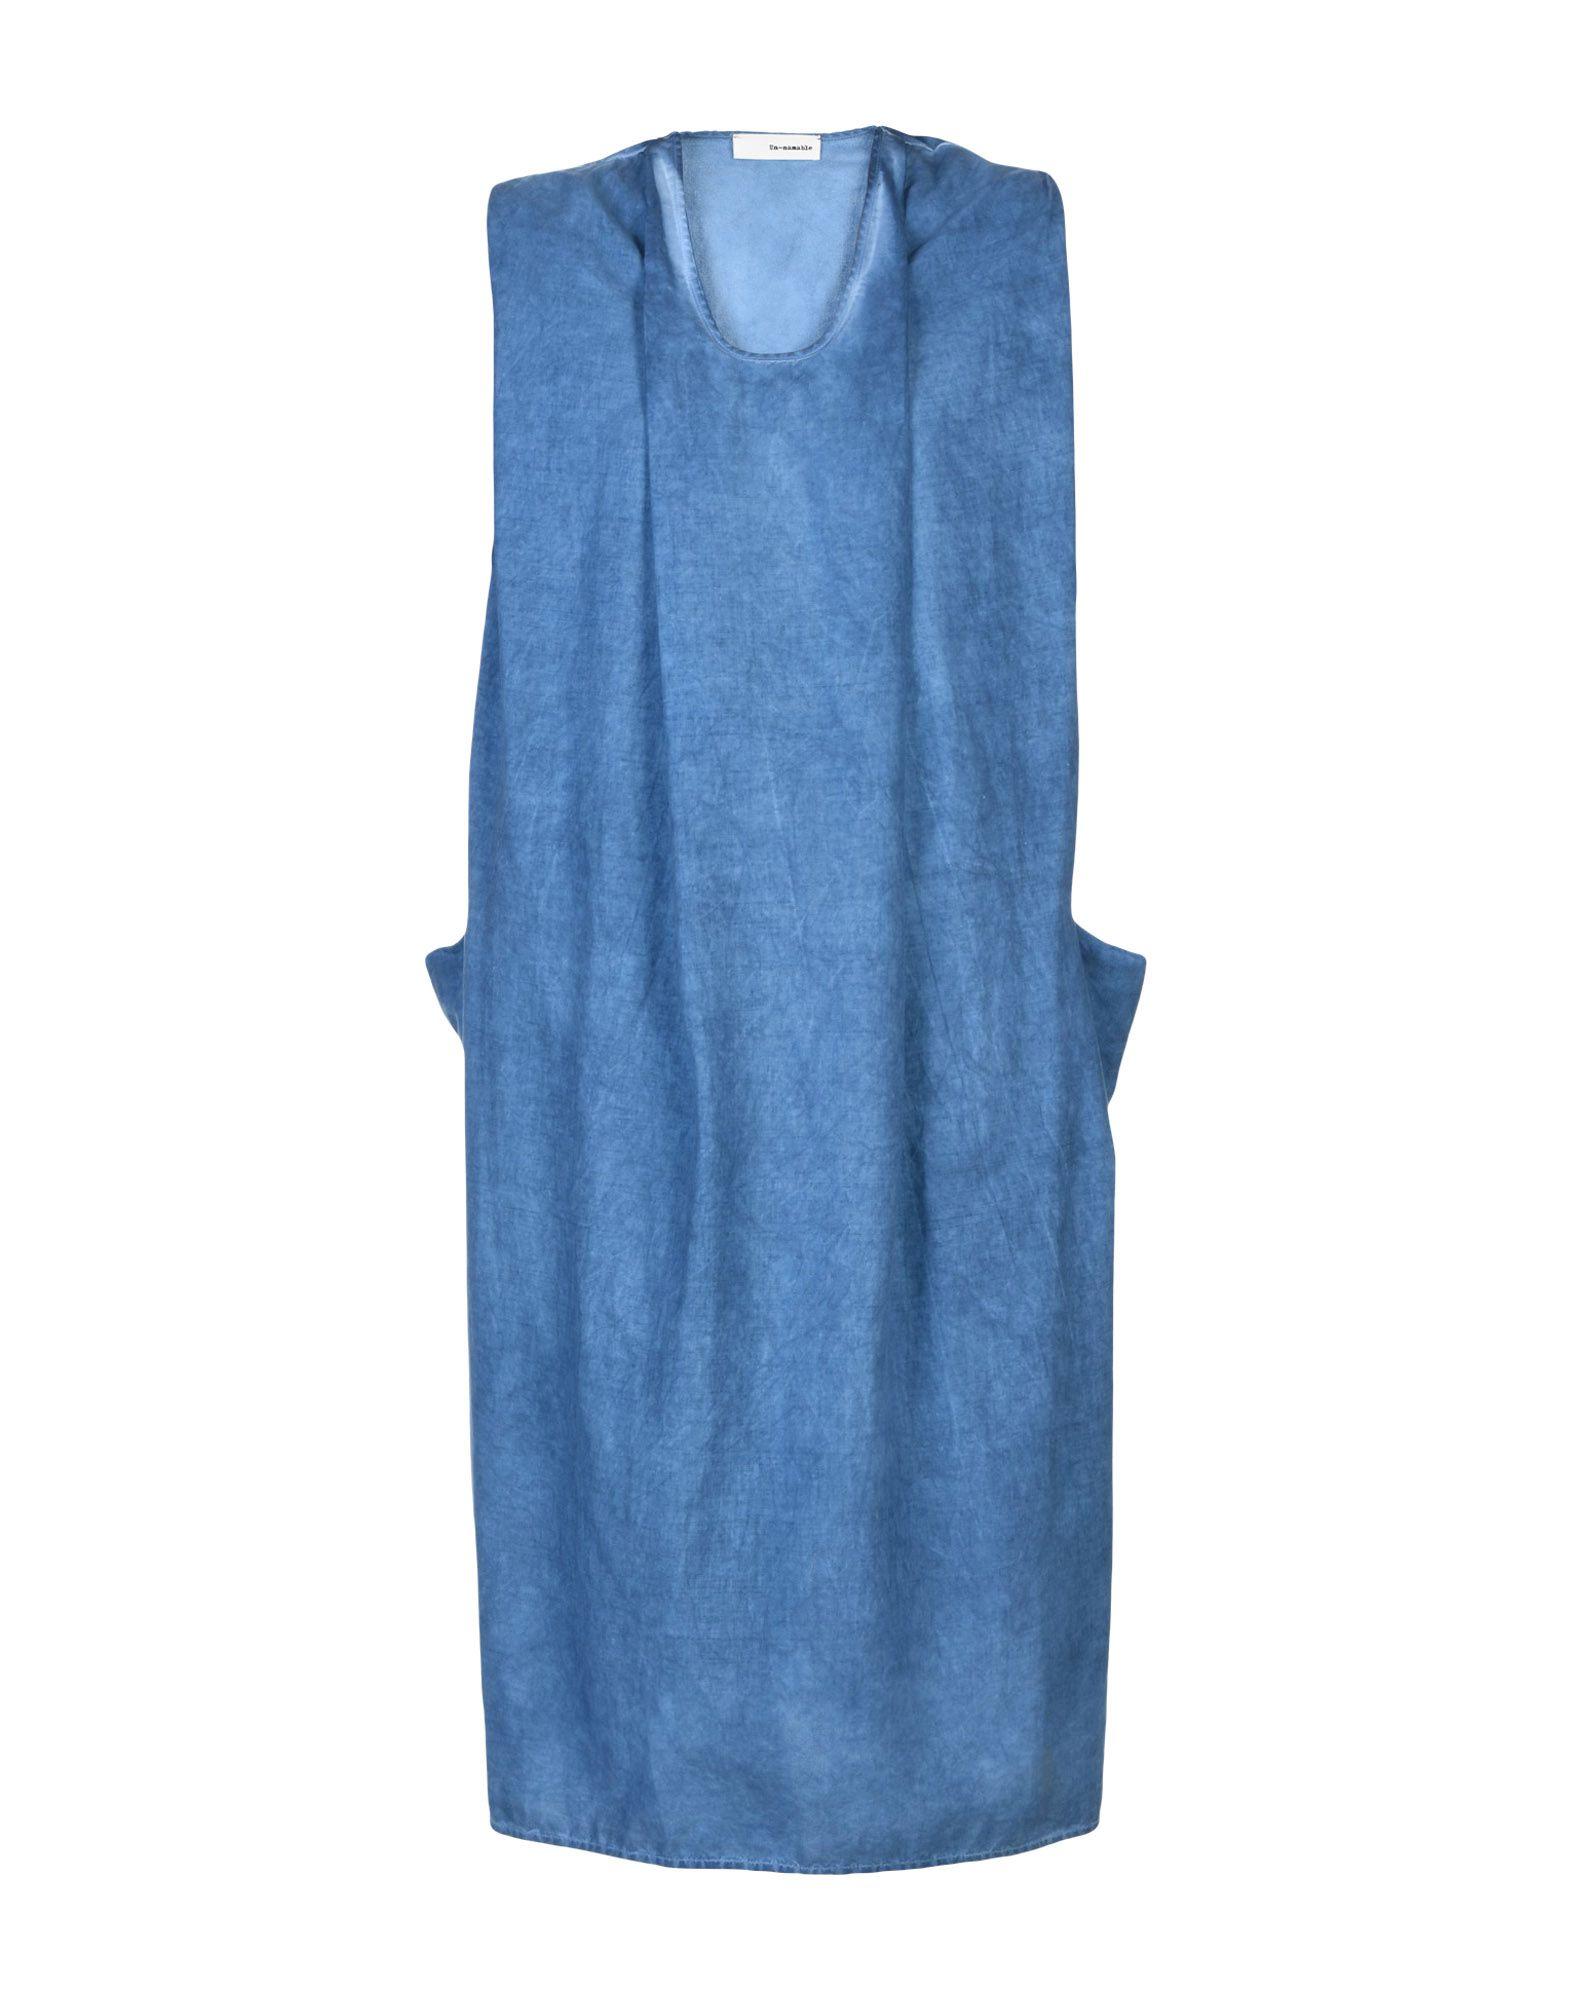 UN-NAMABLE Платье длиной 3/4 tenax платье длиной 3 4